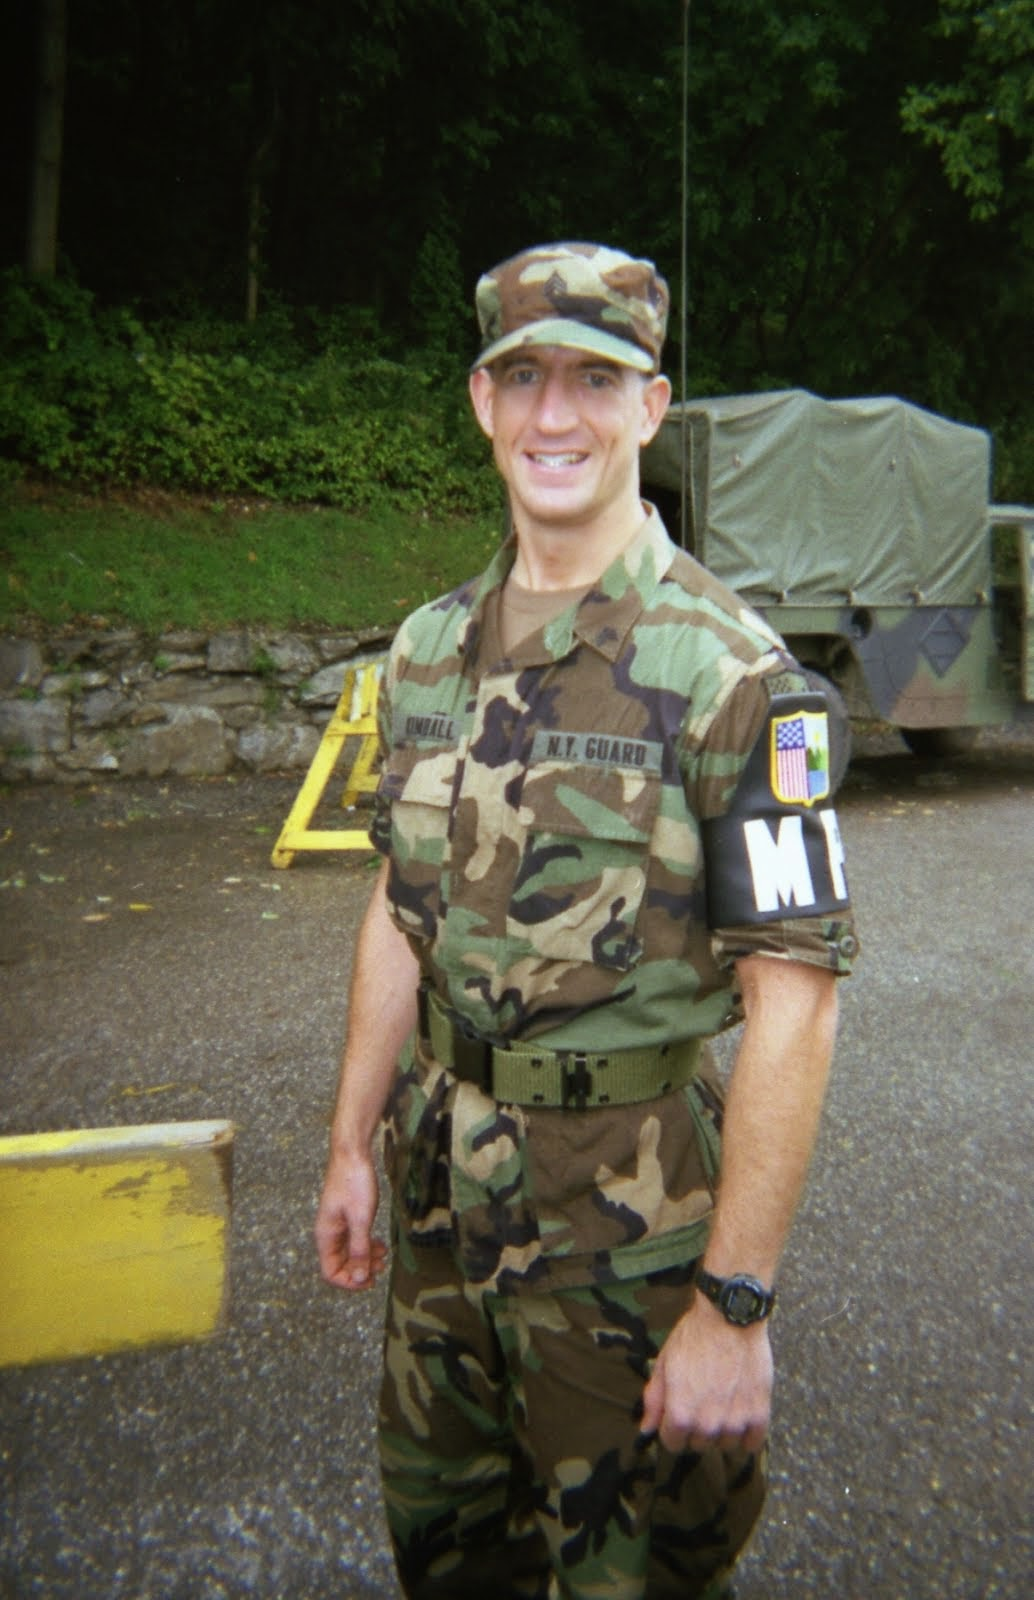 Sergeant, E-5 Thomas Q Kimball